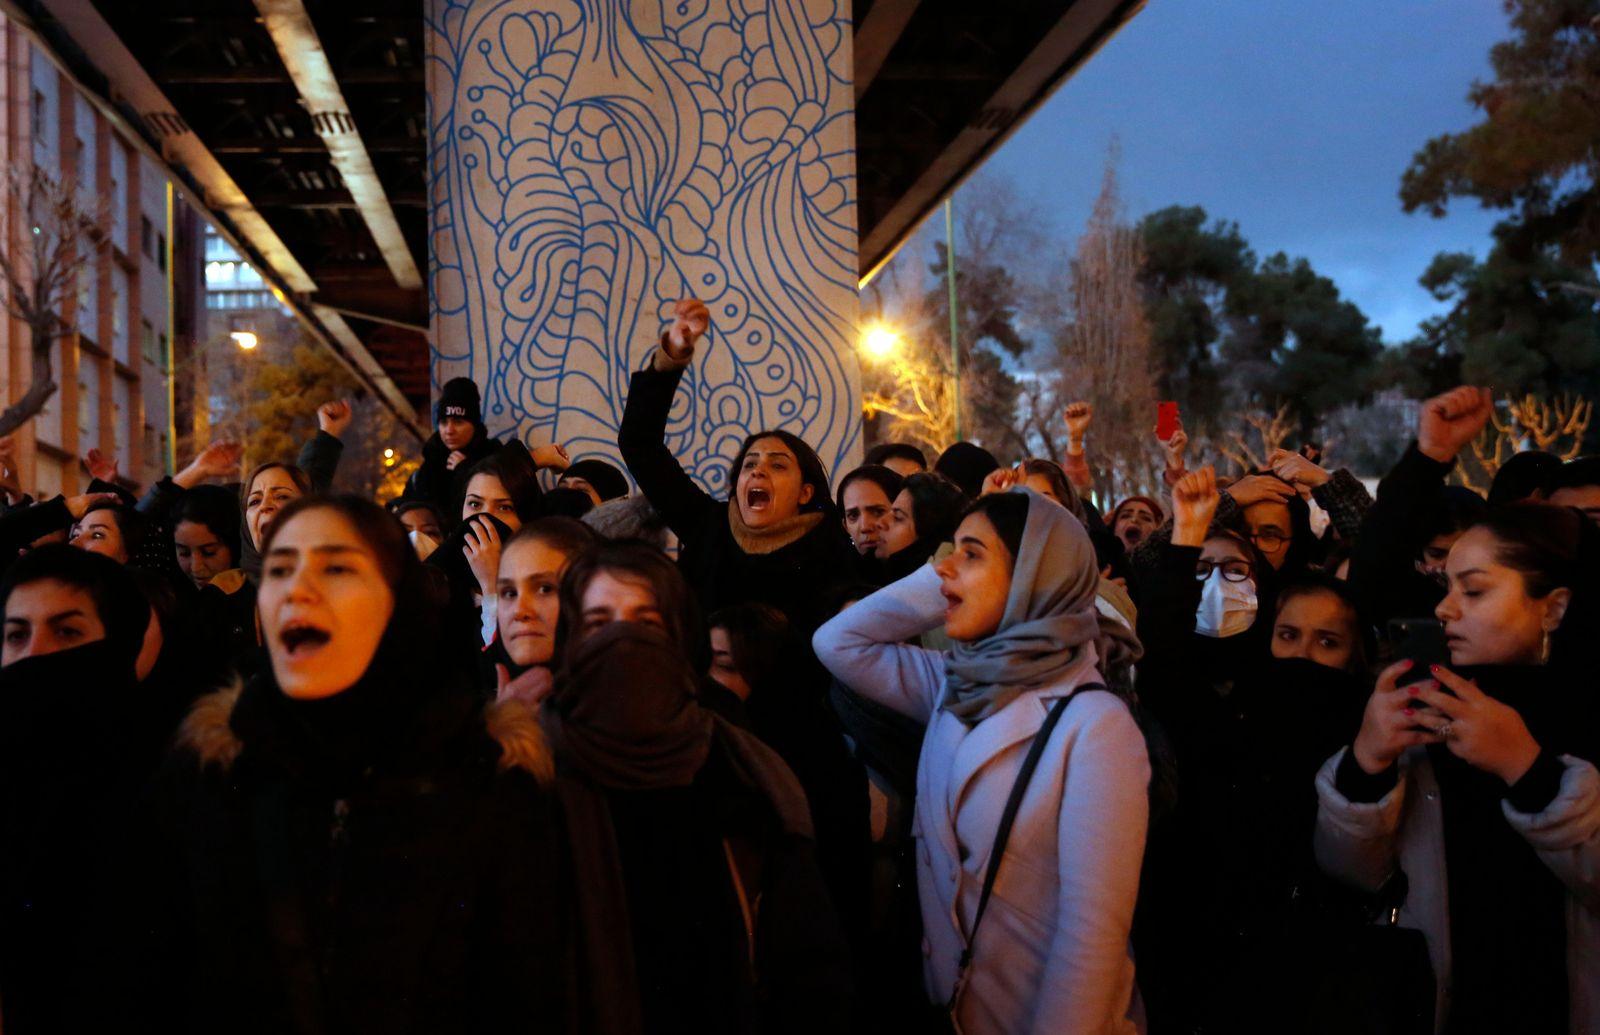 Protests over Iran admits shooting down Ukraine International Airlines plane, Tehran, Iran Islamic Republic Of - 11 Jan 2020